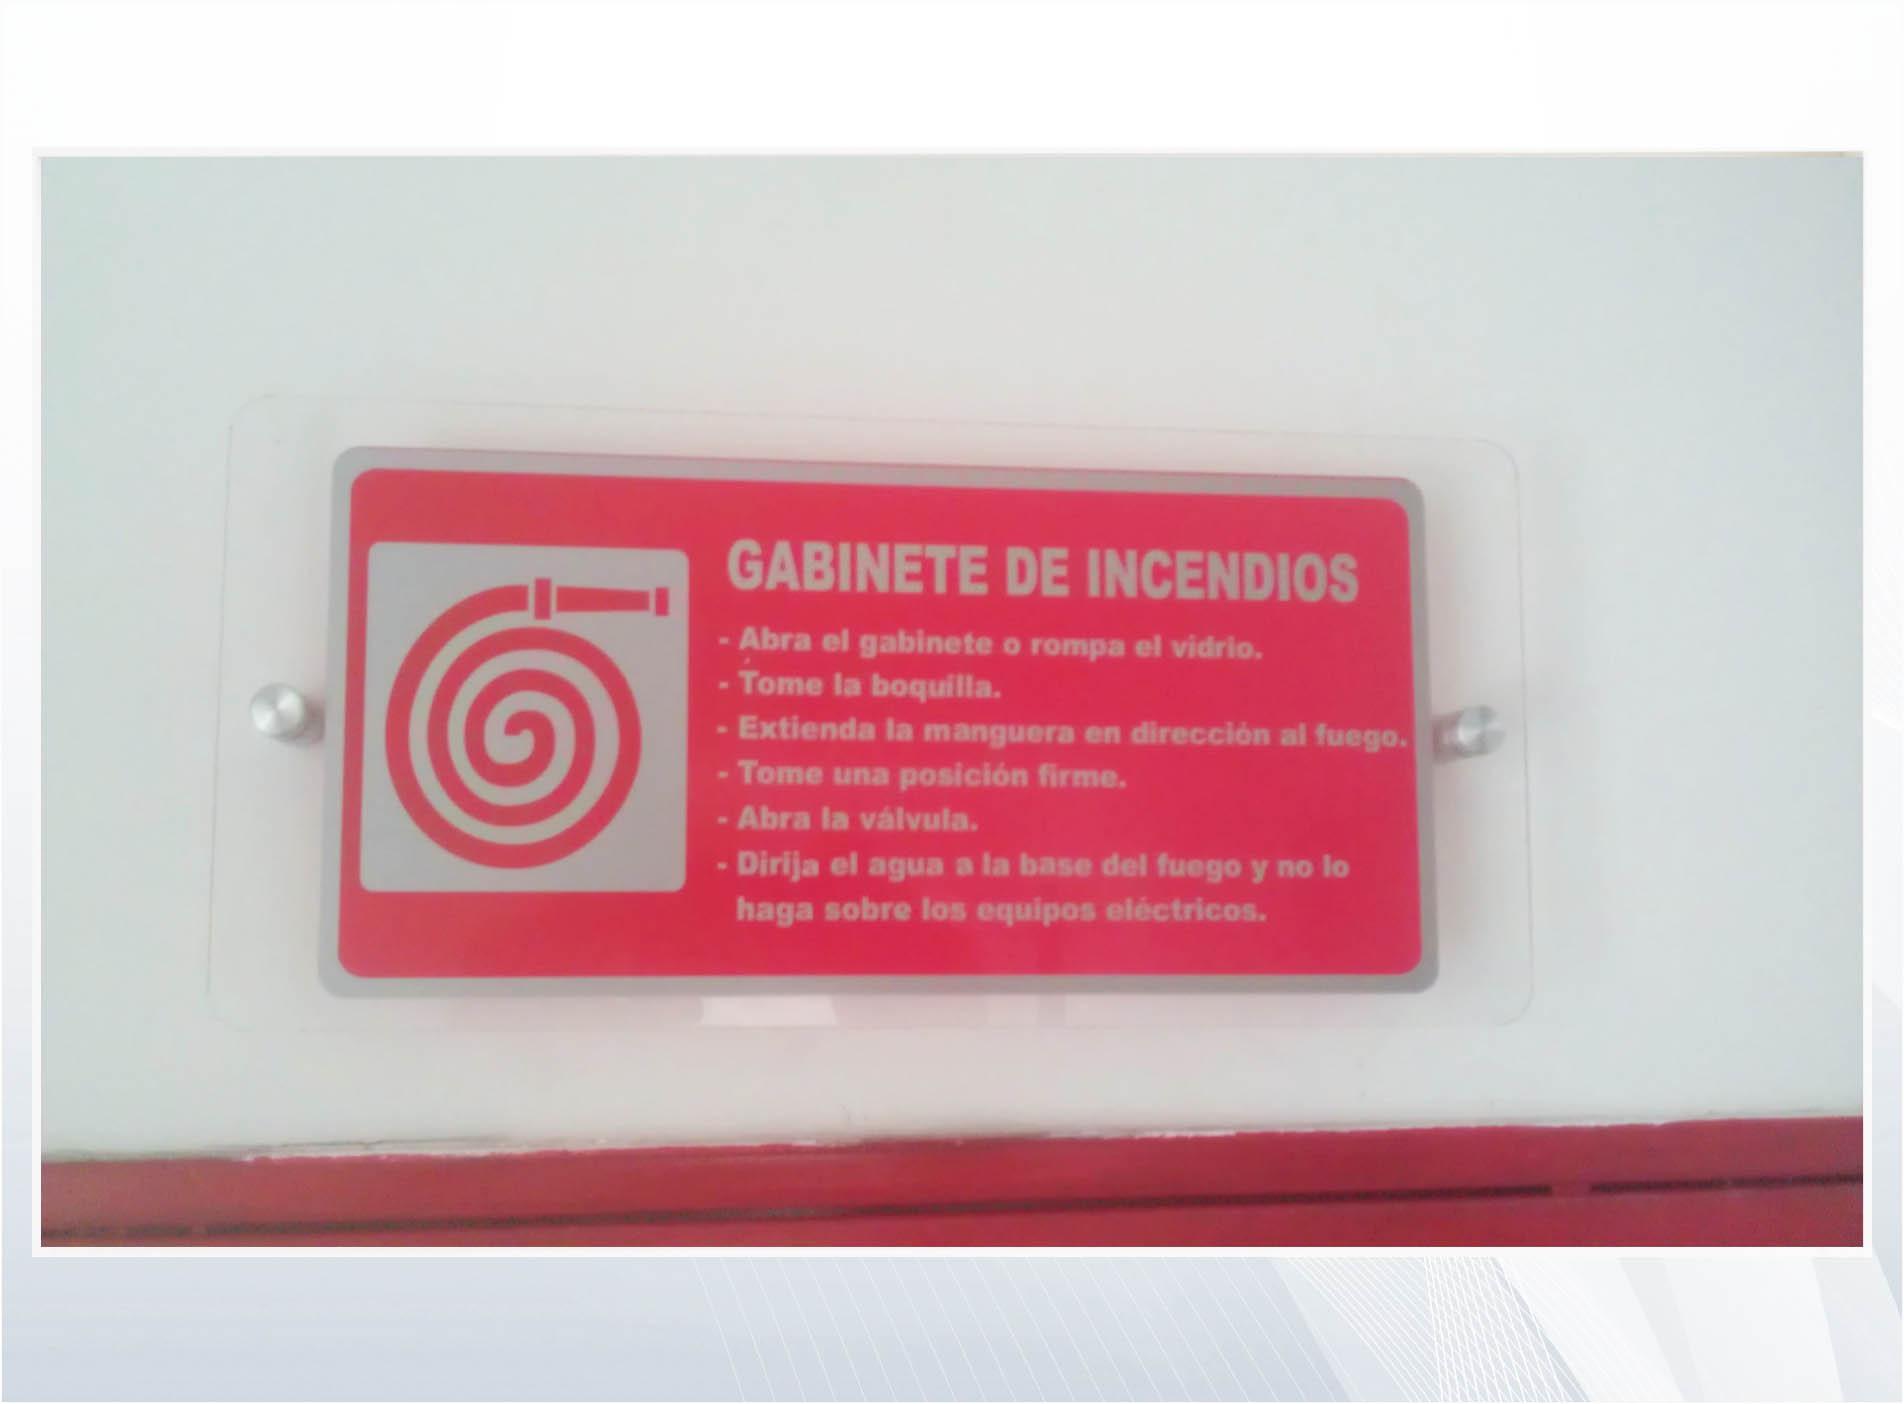 señal_seguridad_acrílico_impresión_directa_dilatadores_aluminio_brc_ggcm